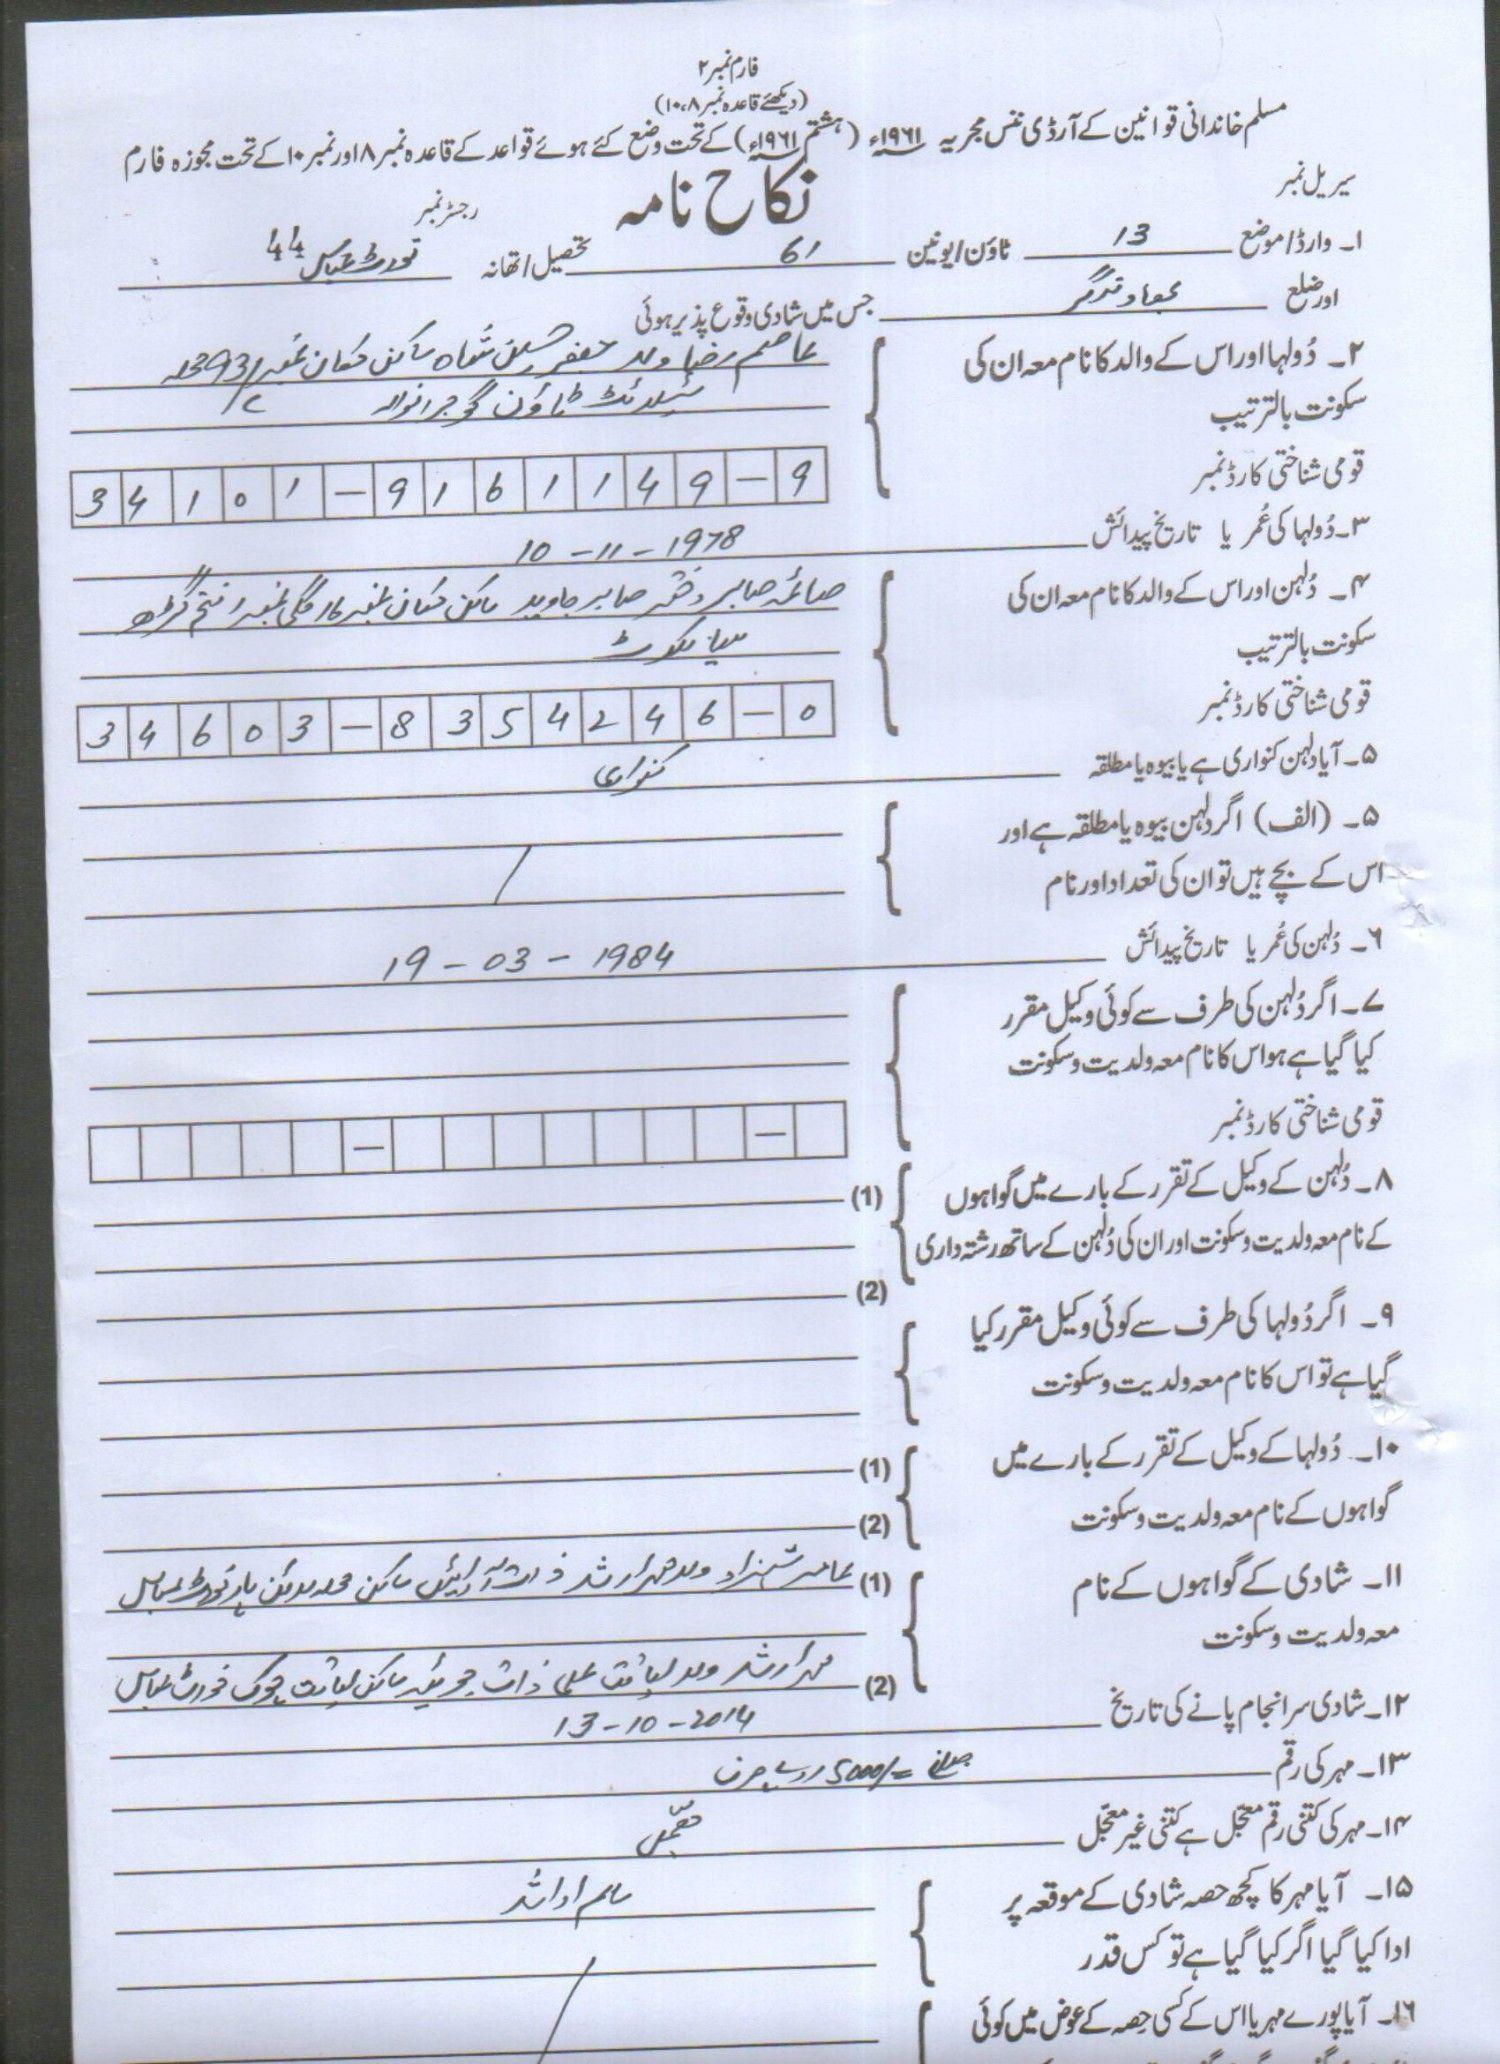 nikah nama form free download  nikah nama urdu nikah nama english nikah nama sample nikah ...